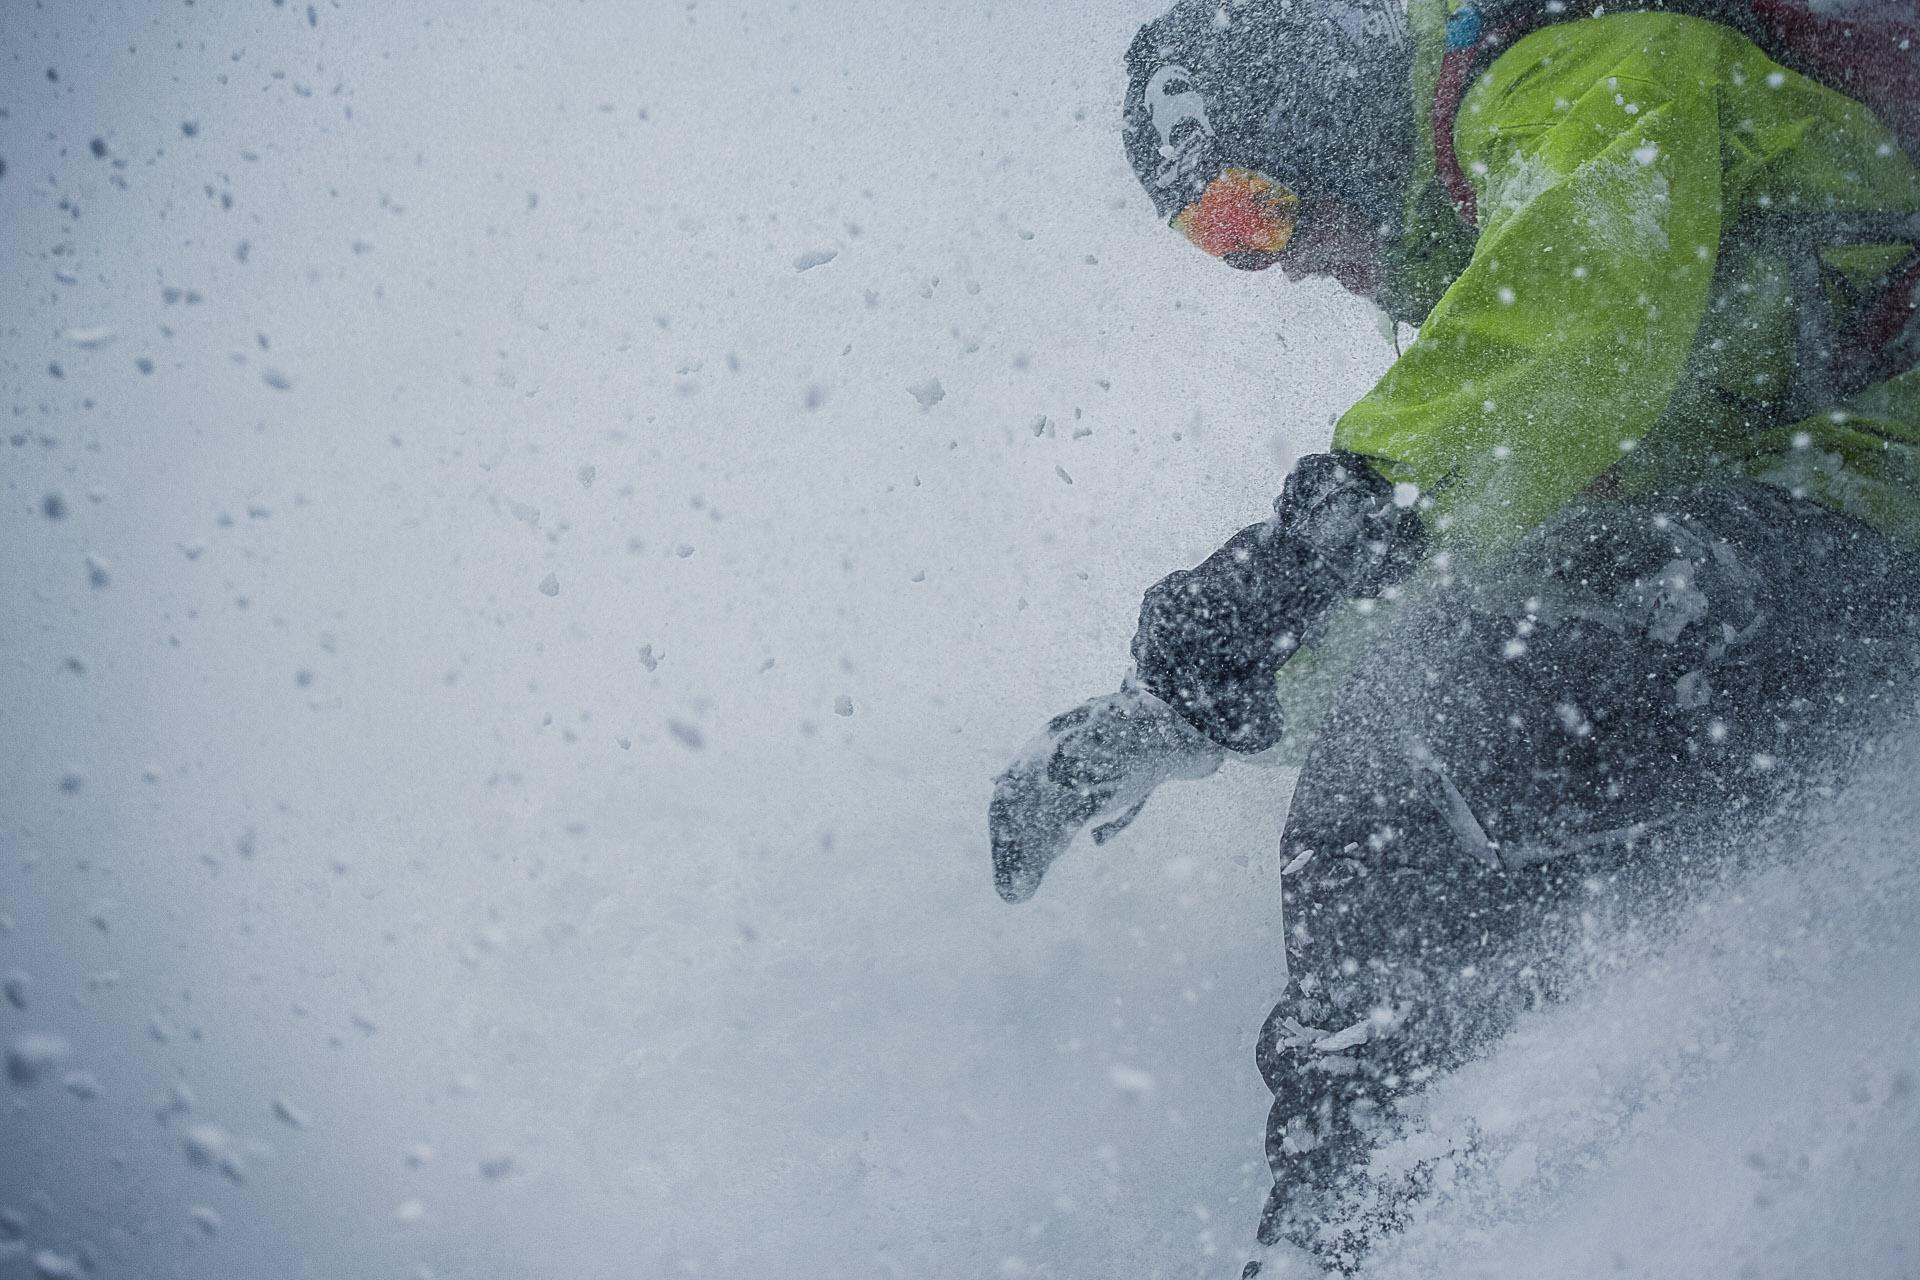 Neil Provo gets barreled on a Cascade storm day above Holden Village, Washington